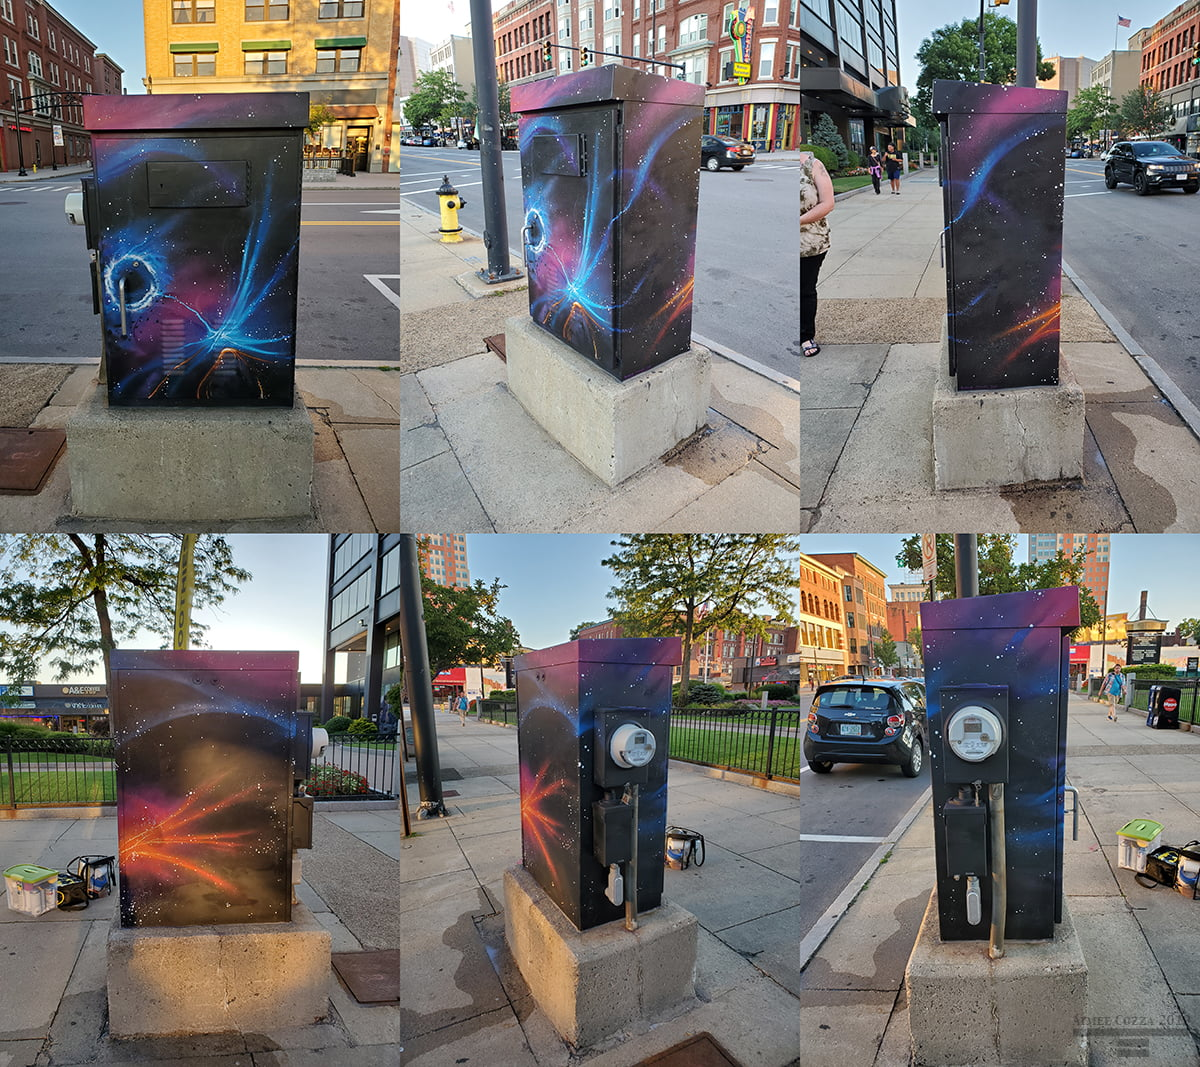 1000 Elm St Utility Box, Manchester, NH, 2019